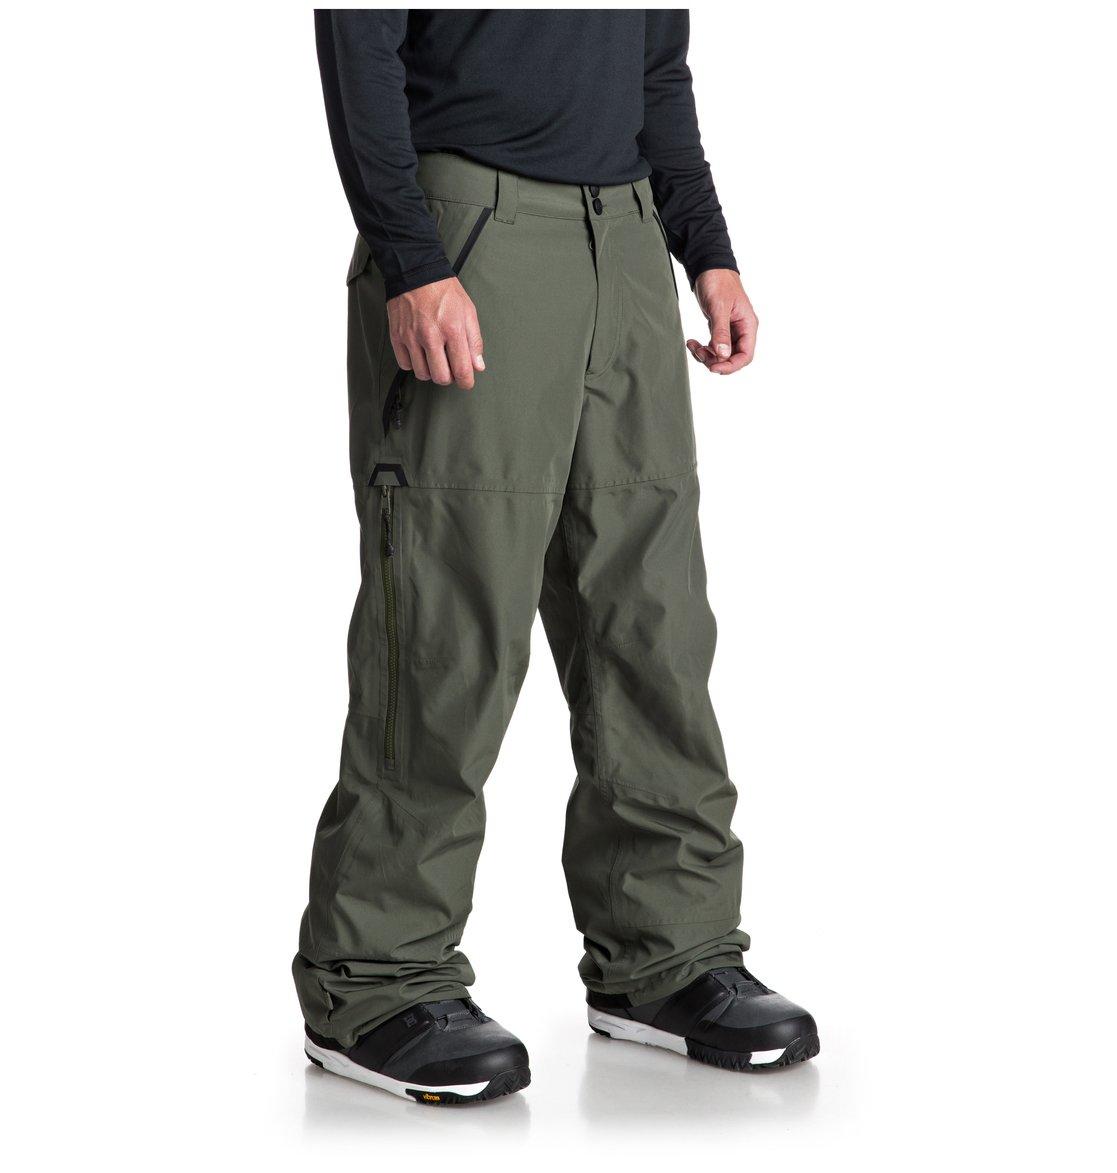 Shoes Edytp03032 Dc Hombre Nieve Nomad Shell Pantalón Para xw6Xqc0OP